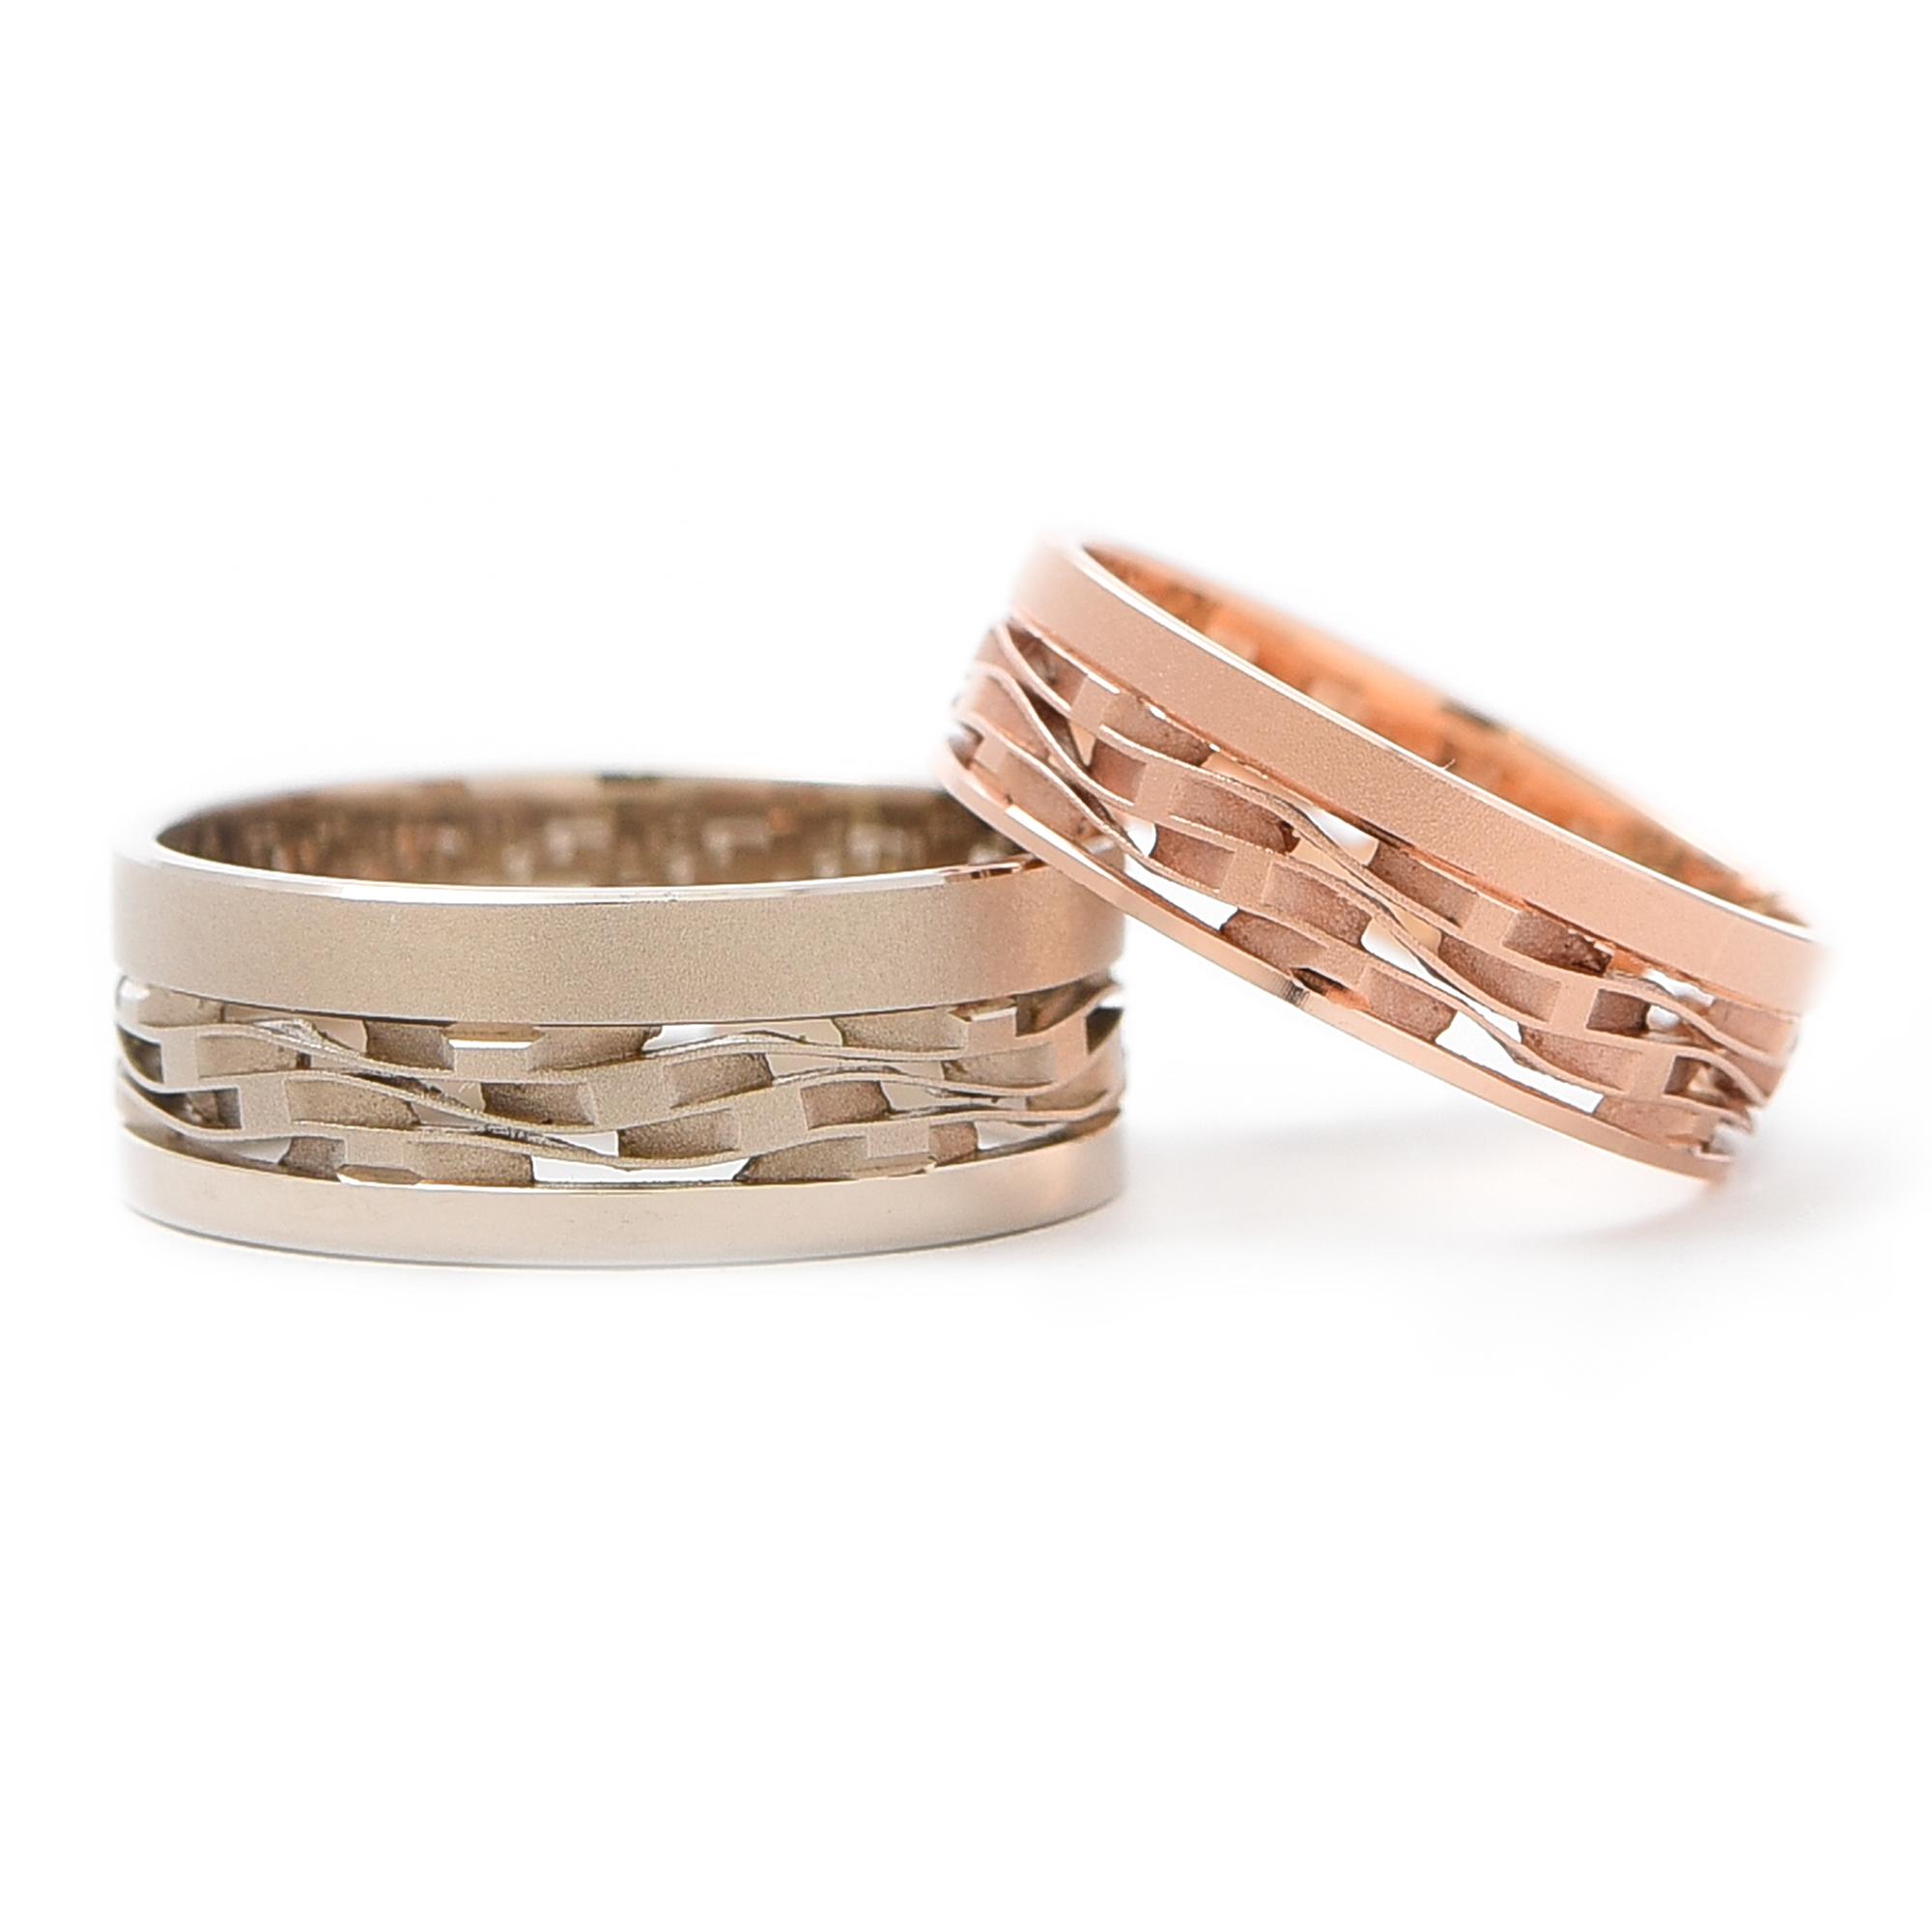 輪高崎工房の結婚指輪|HR-106